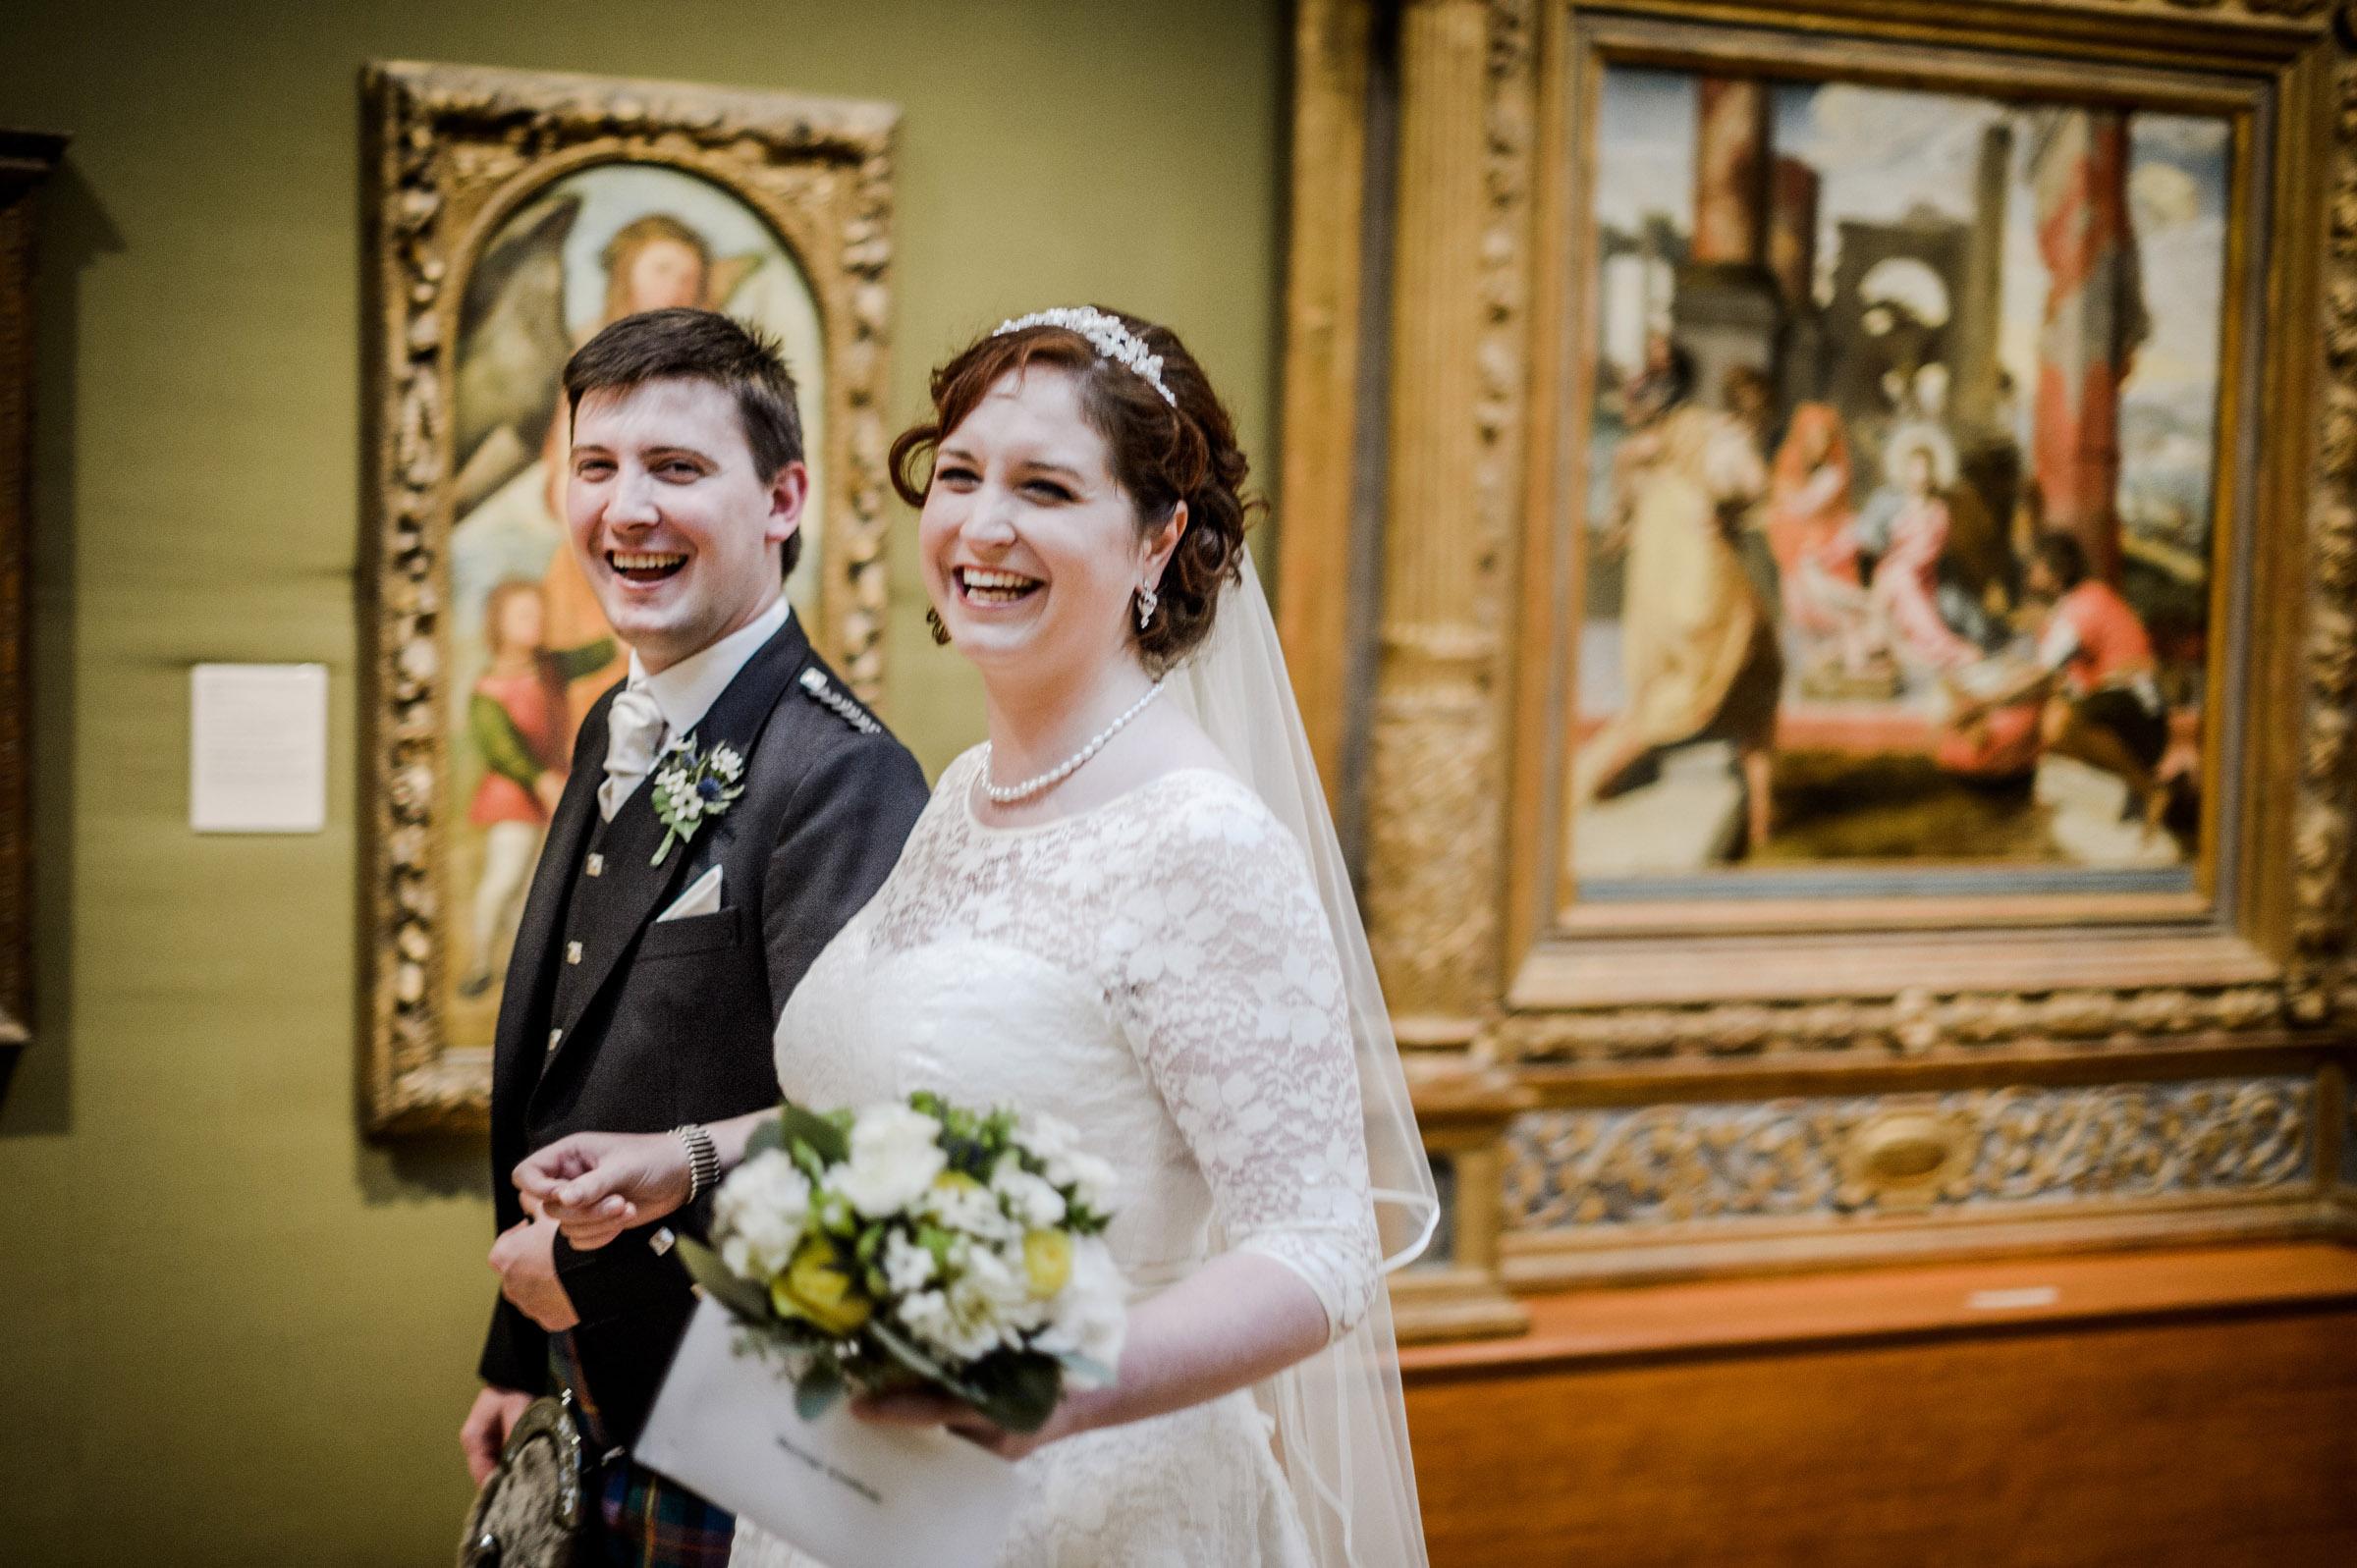 Ashmolean-Museum-Wedding-Pictures-0032.jpg